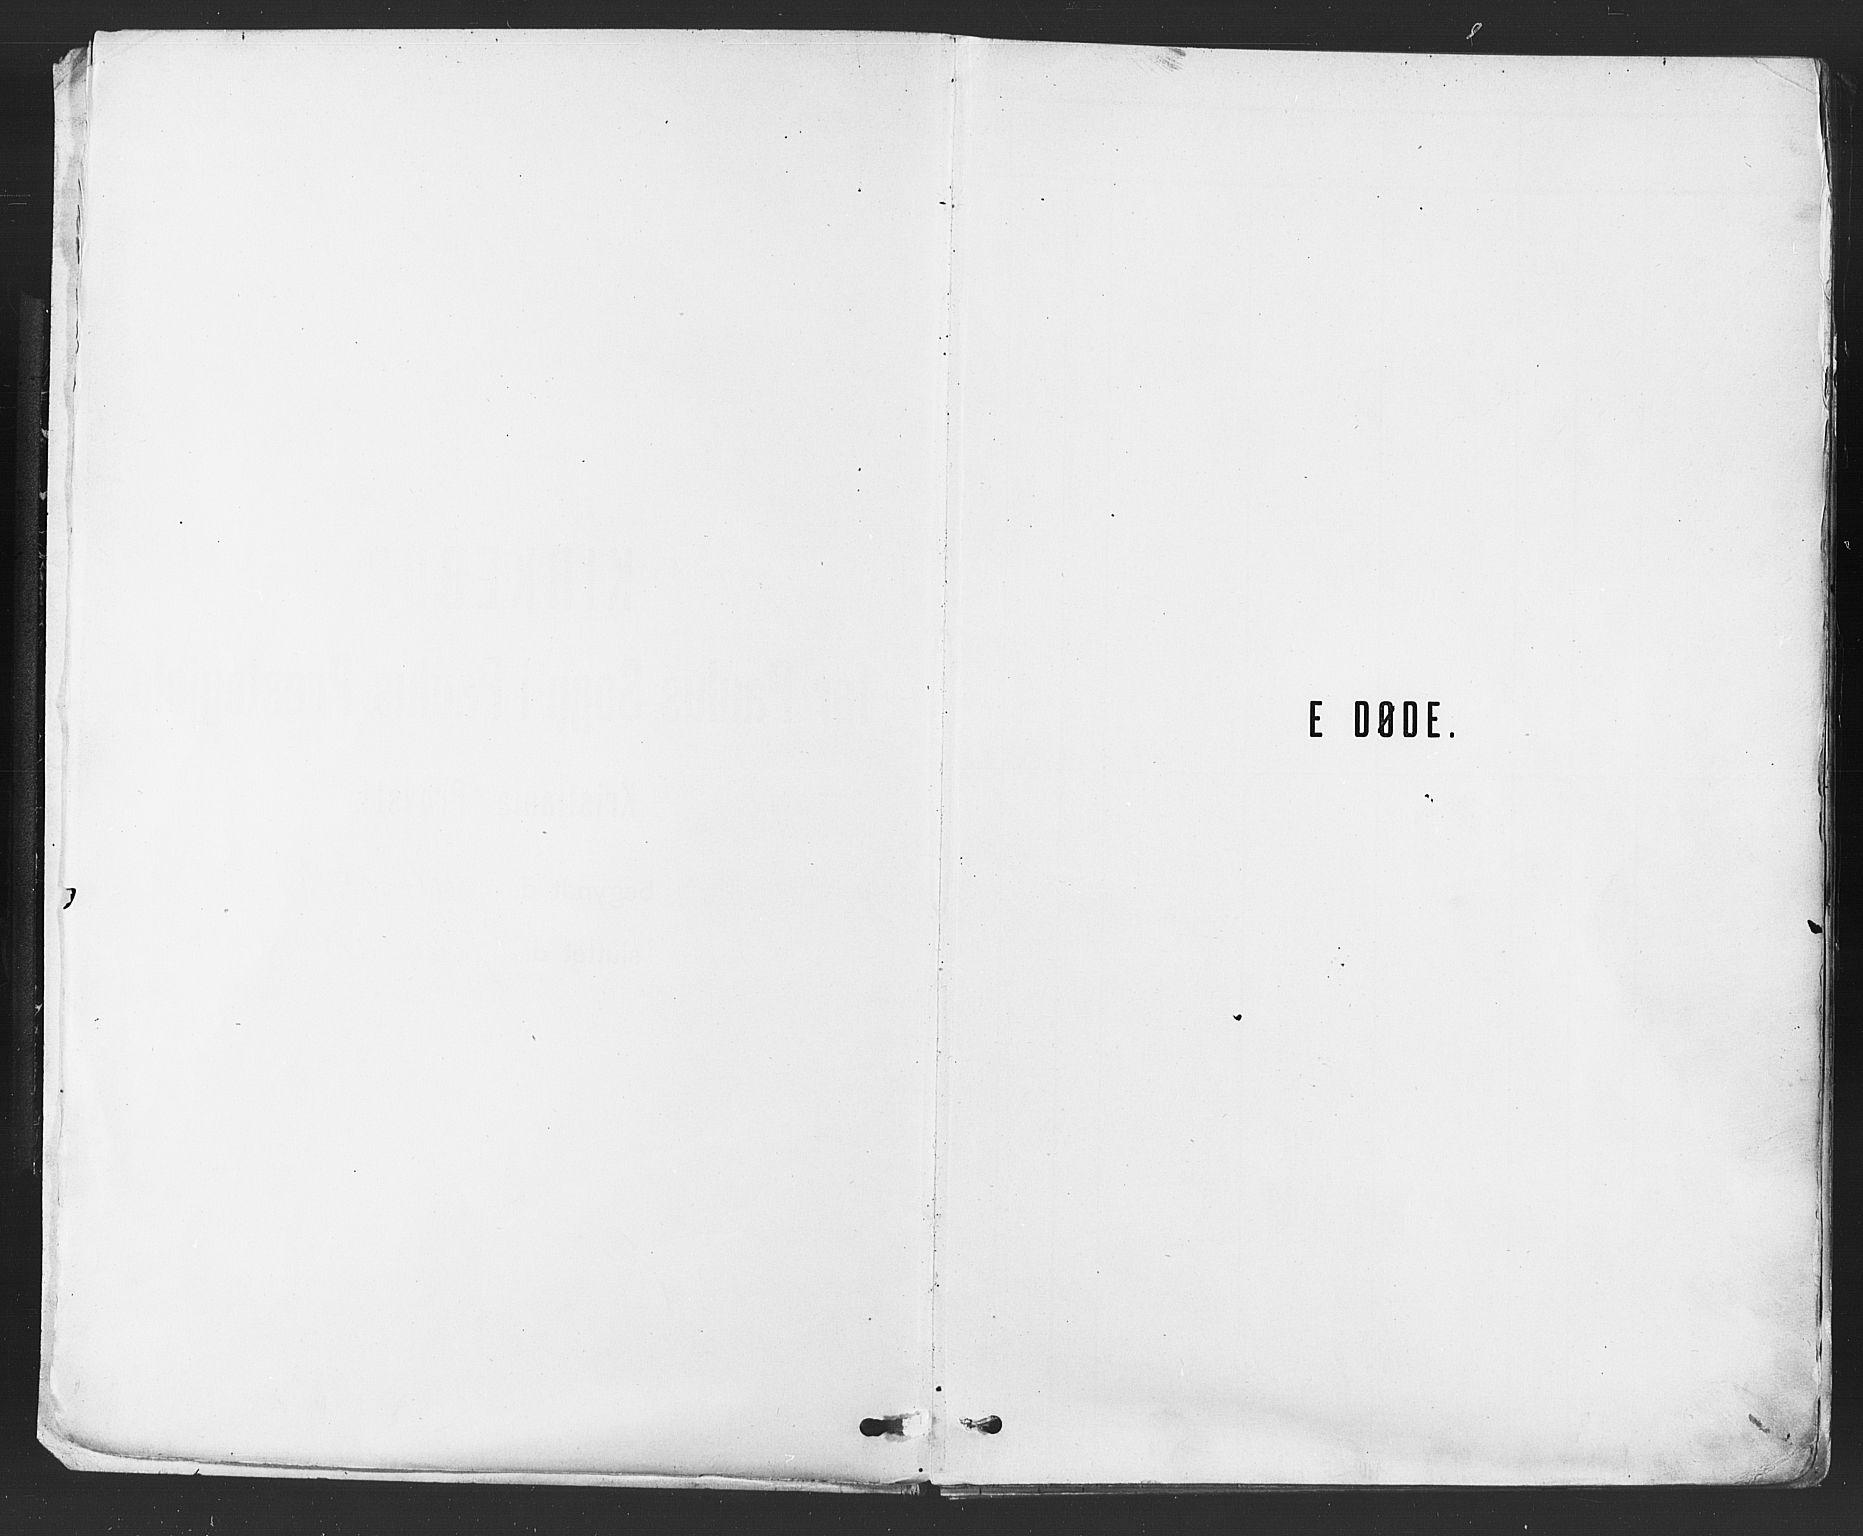 SAO, Paulus prestekontor Kirkebøker, F/Fa/L0012: Parish register (official) no. 12, 1897-1908